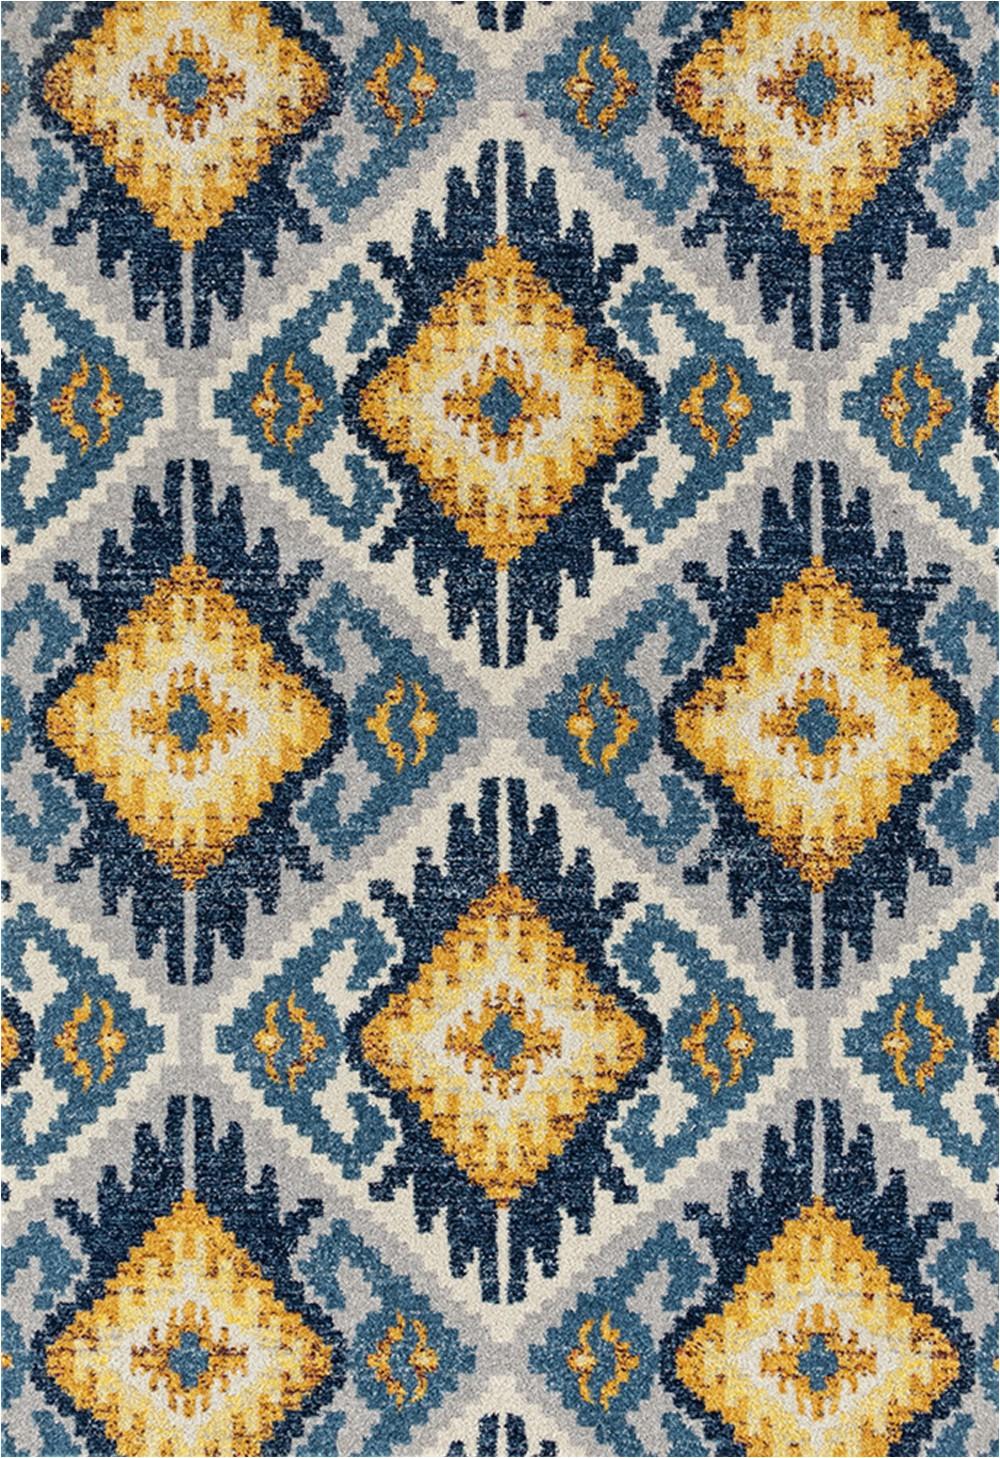 Diamond Scroll Blue Rug Designer Home Niragia area Rug 713 Tinley Midnight